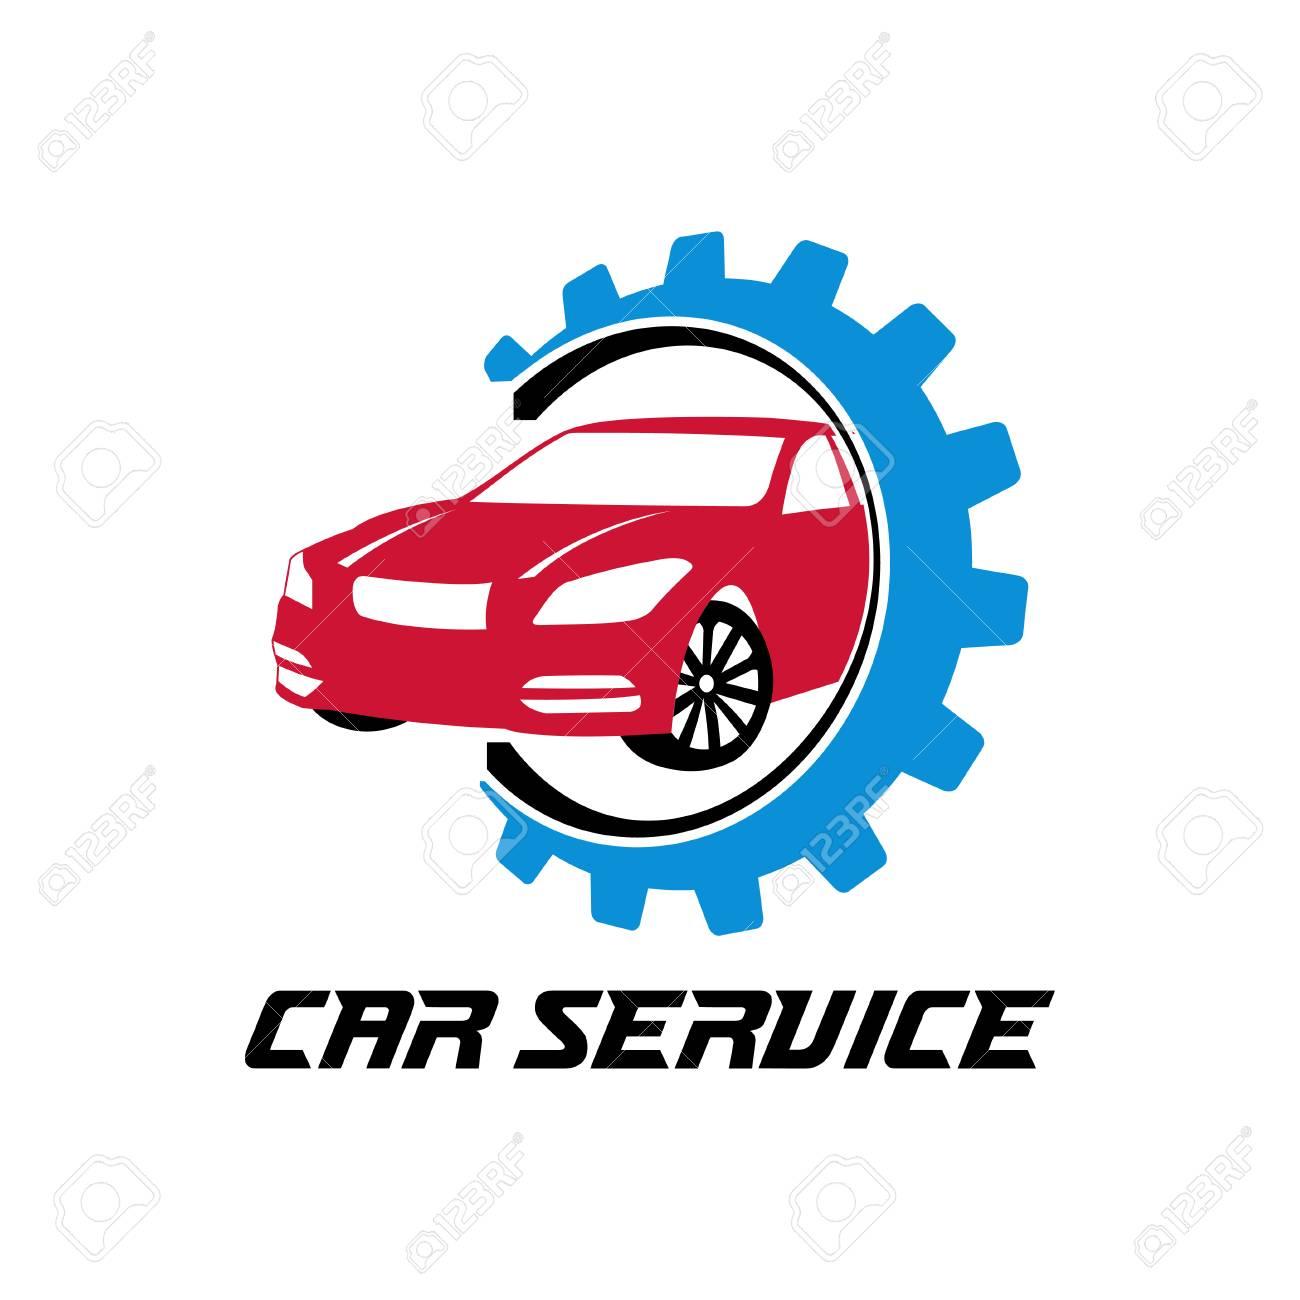 Car Dealer Or Maintenance Service Vector Logo Design Template